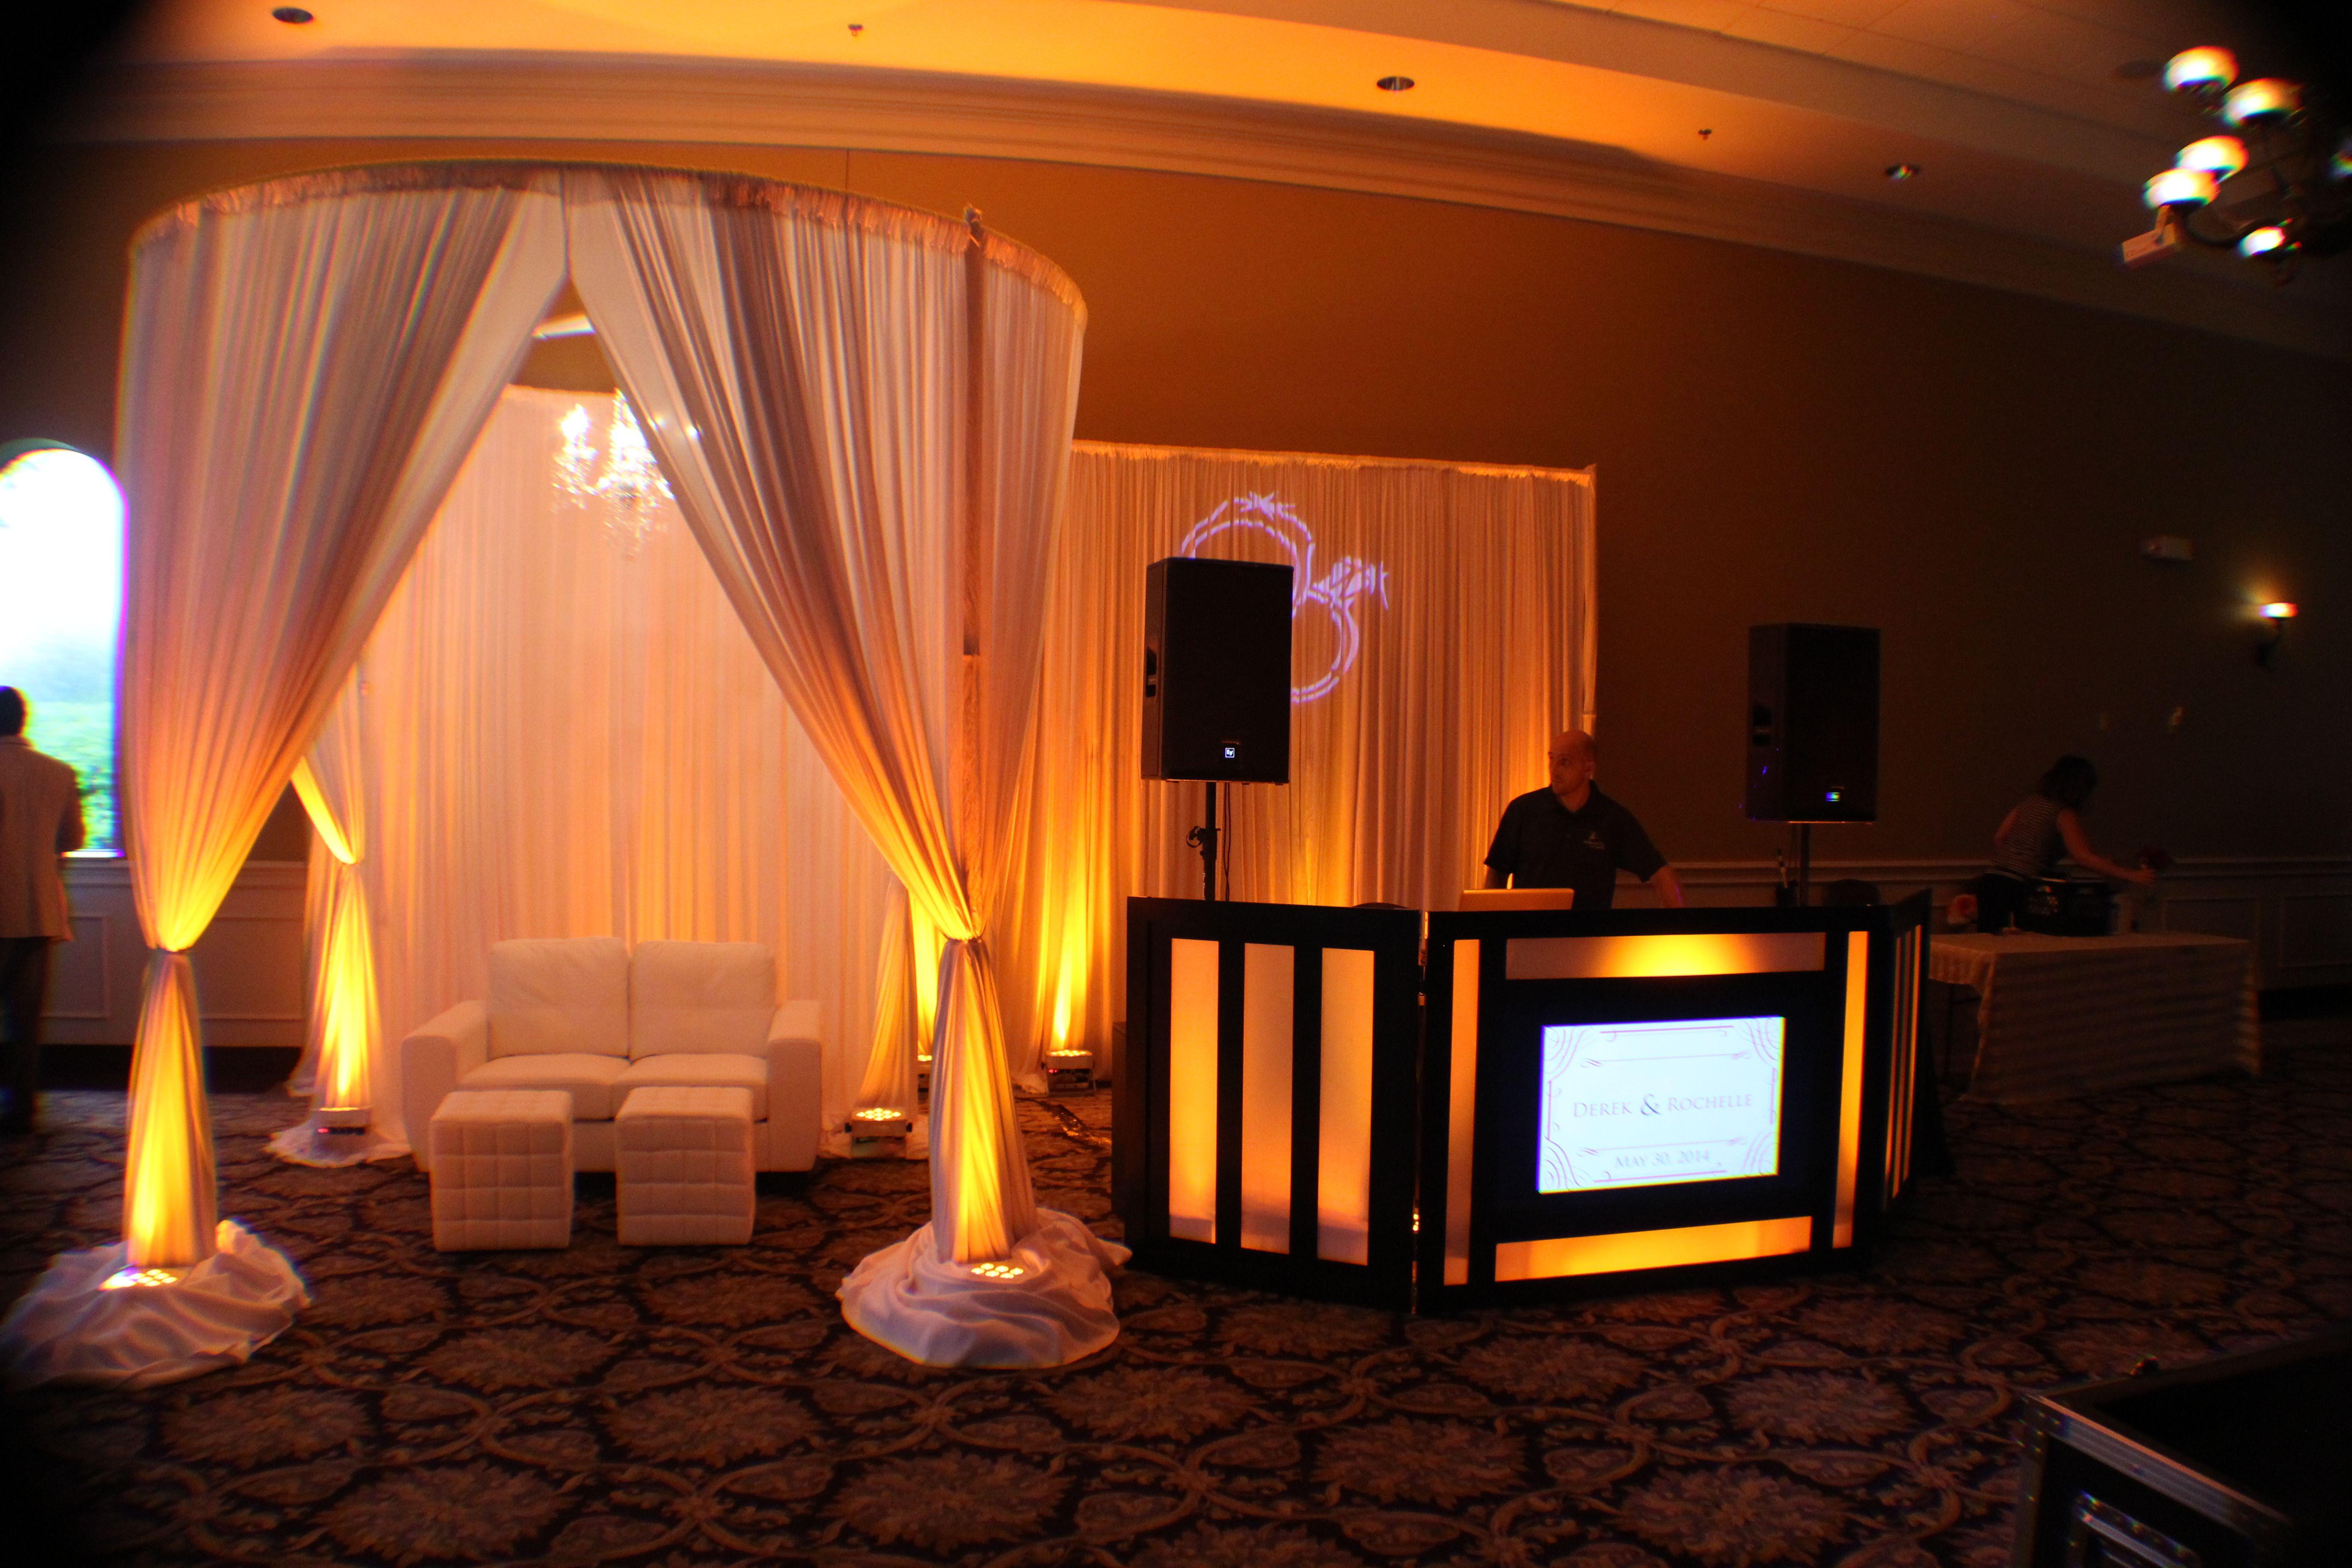 Our Bridal Show Setup Of Our Elegant Round Draping Chuppah With Chandelier Lounge Furniture Led Dj Booth With Monogram Wedding Dj Setup Wedding Dj Uplighting